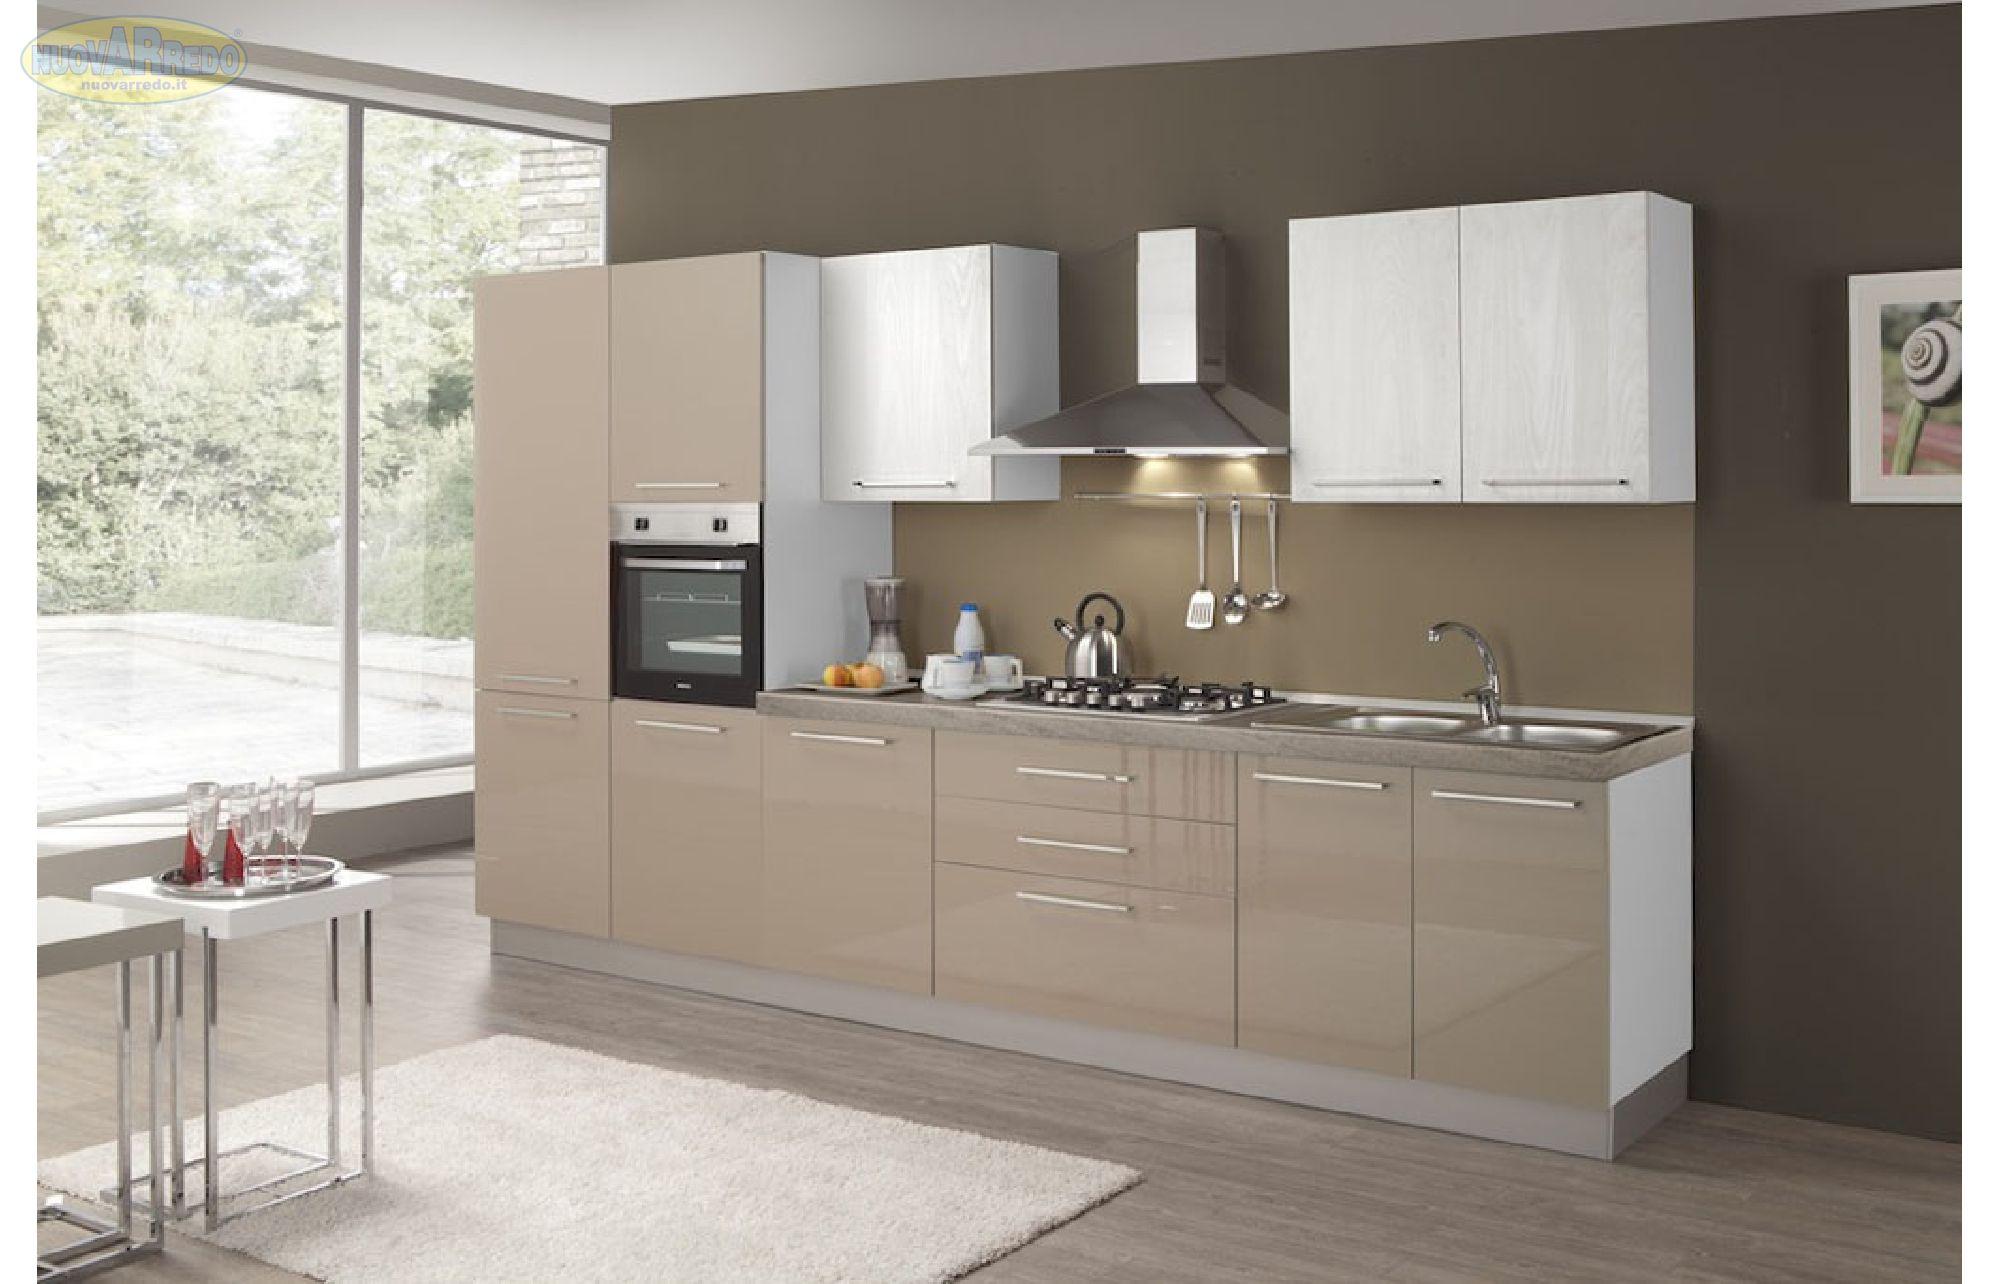 Mobili Cucina Componibili On Line. Kitchen Pinterest With Mobili Cucina Componibili On Line ...